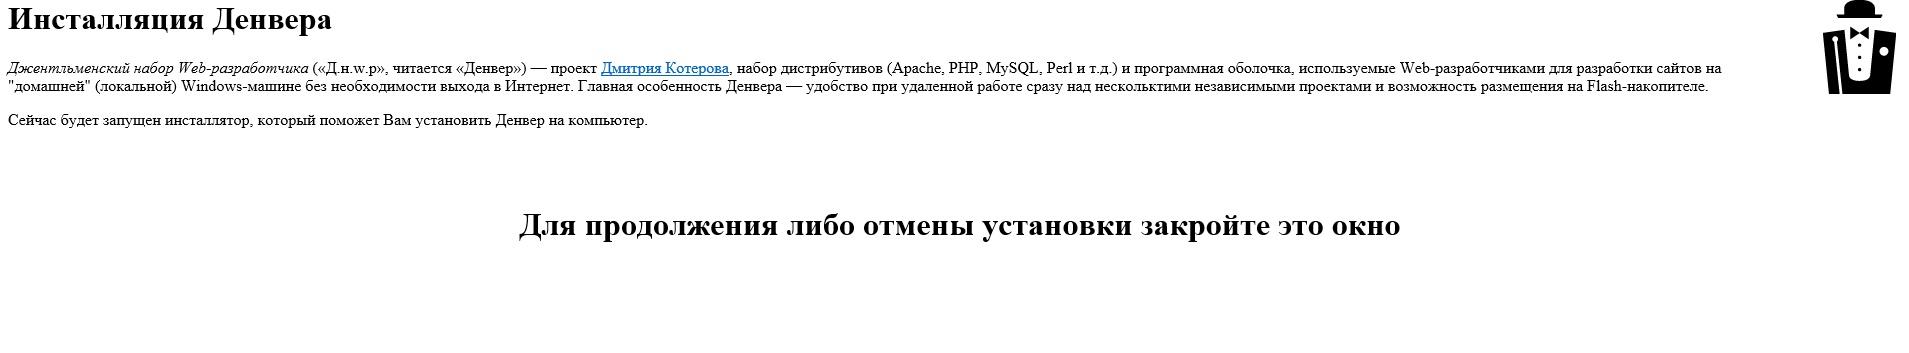 ustanovit_denwer3